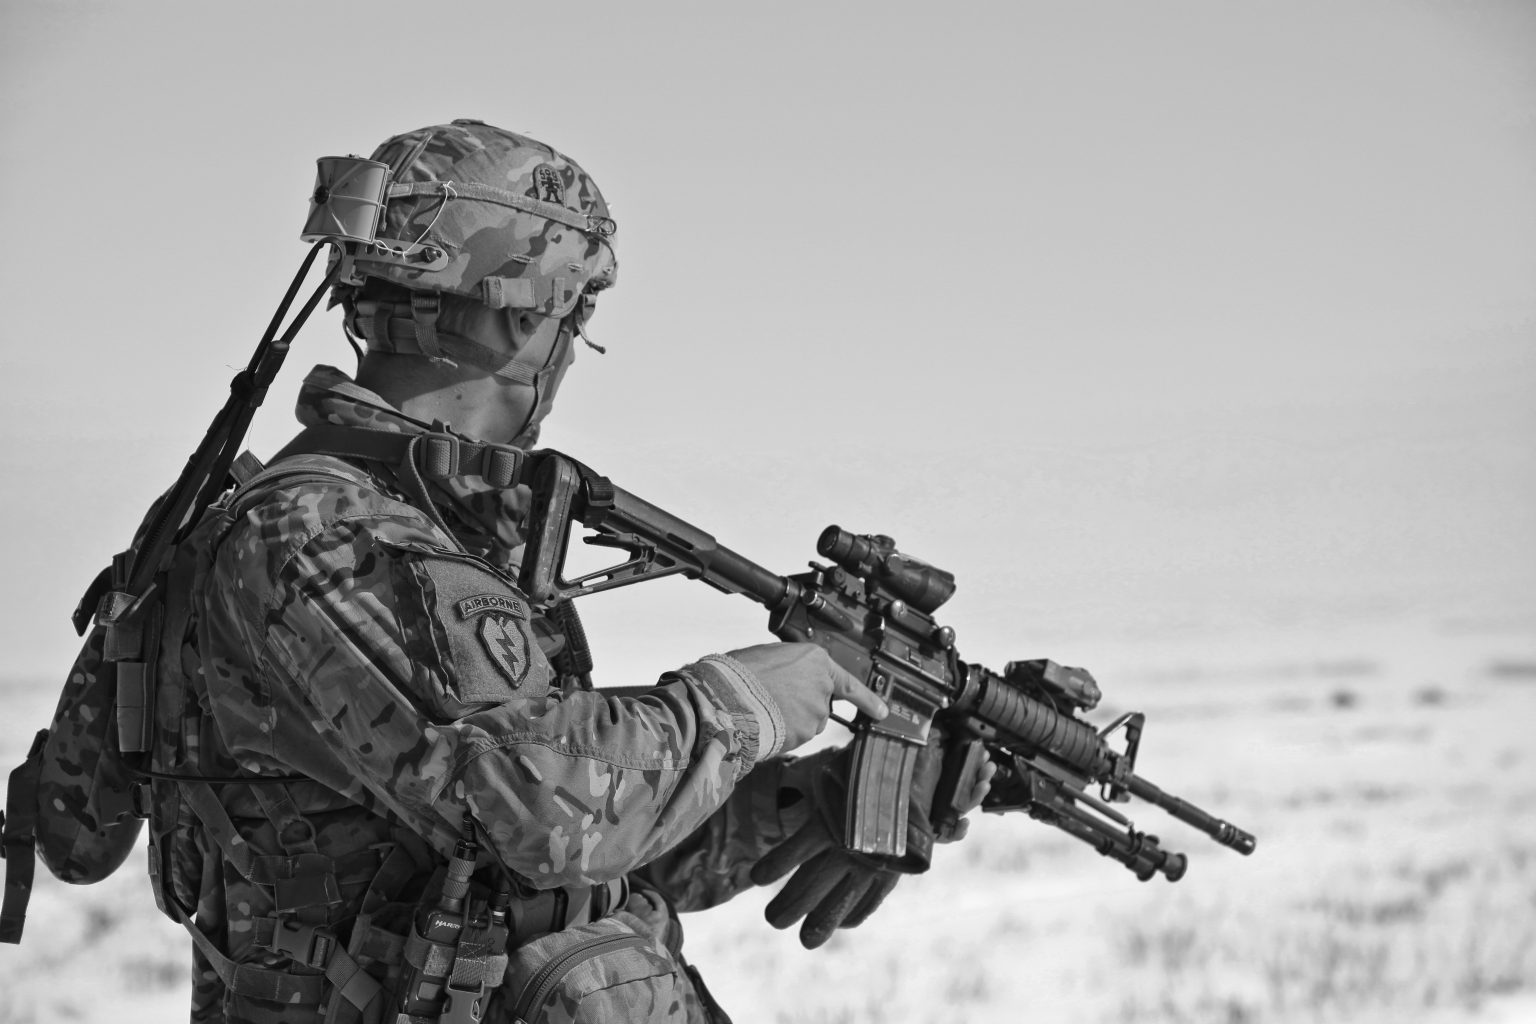 Soldier, veteran, PTSD